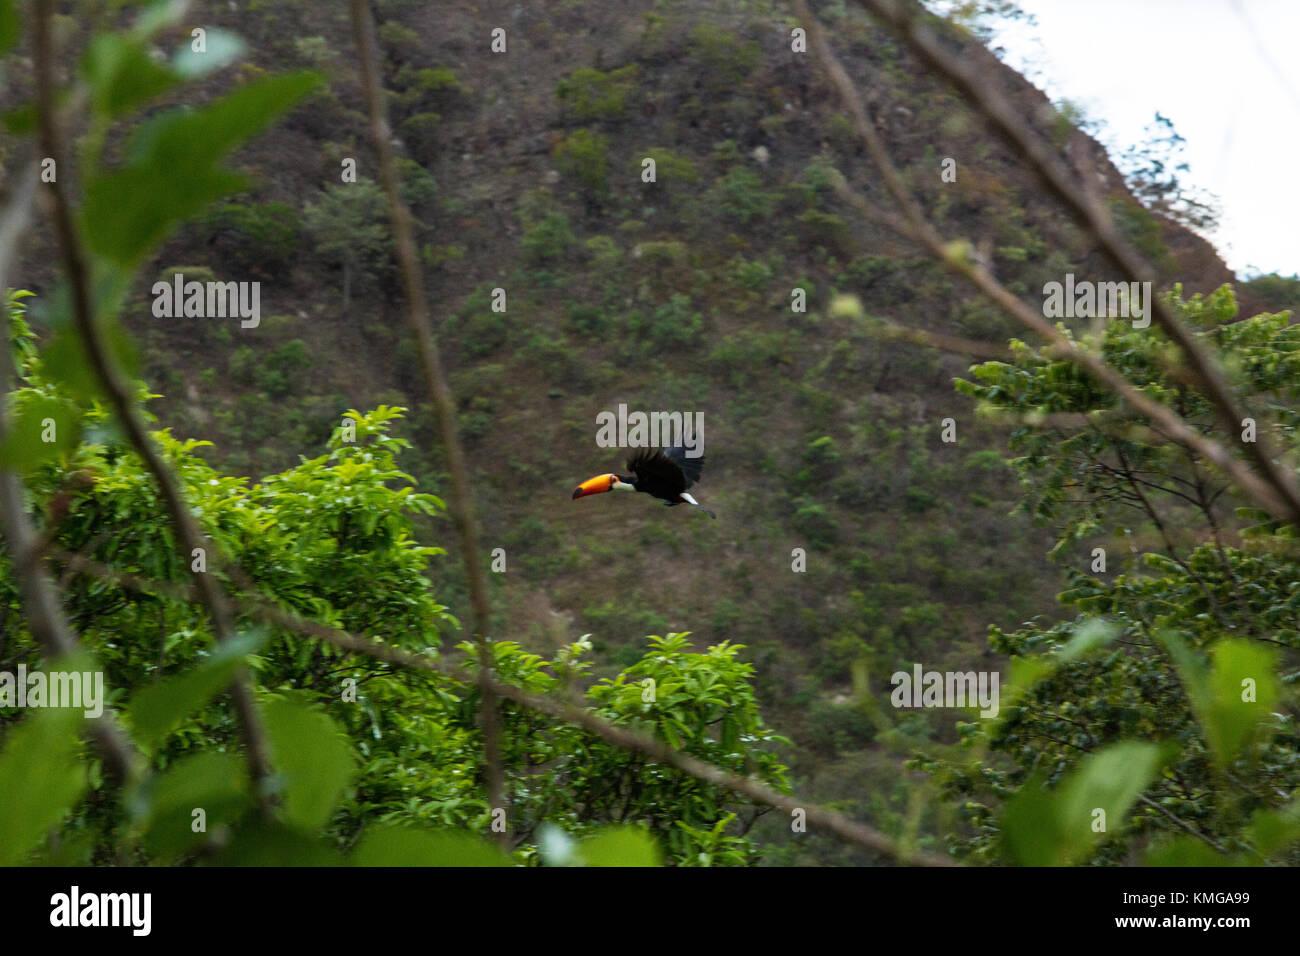 Tucano - Stock Image